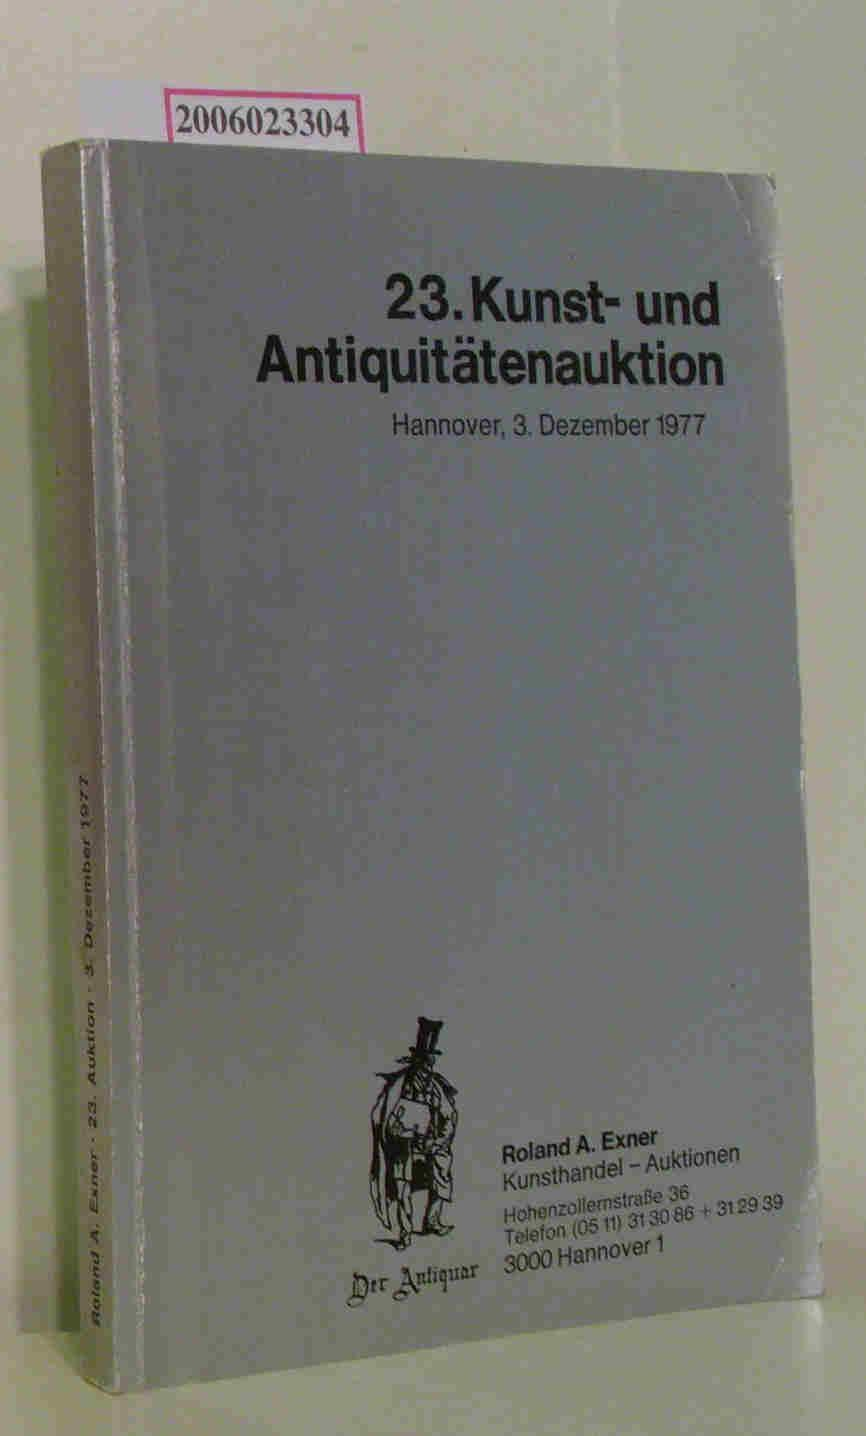 Jahrhundert 15.-19 Auktion 21 1977 Ketterer München